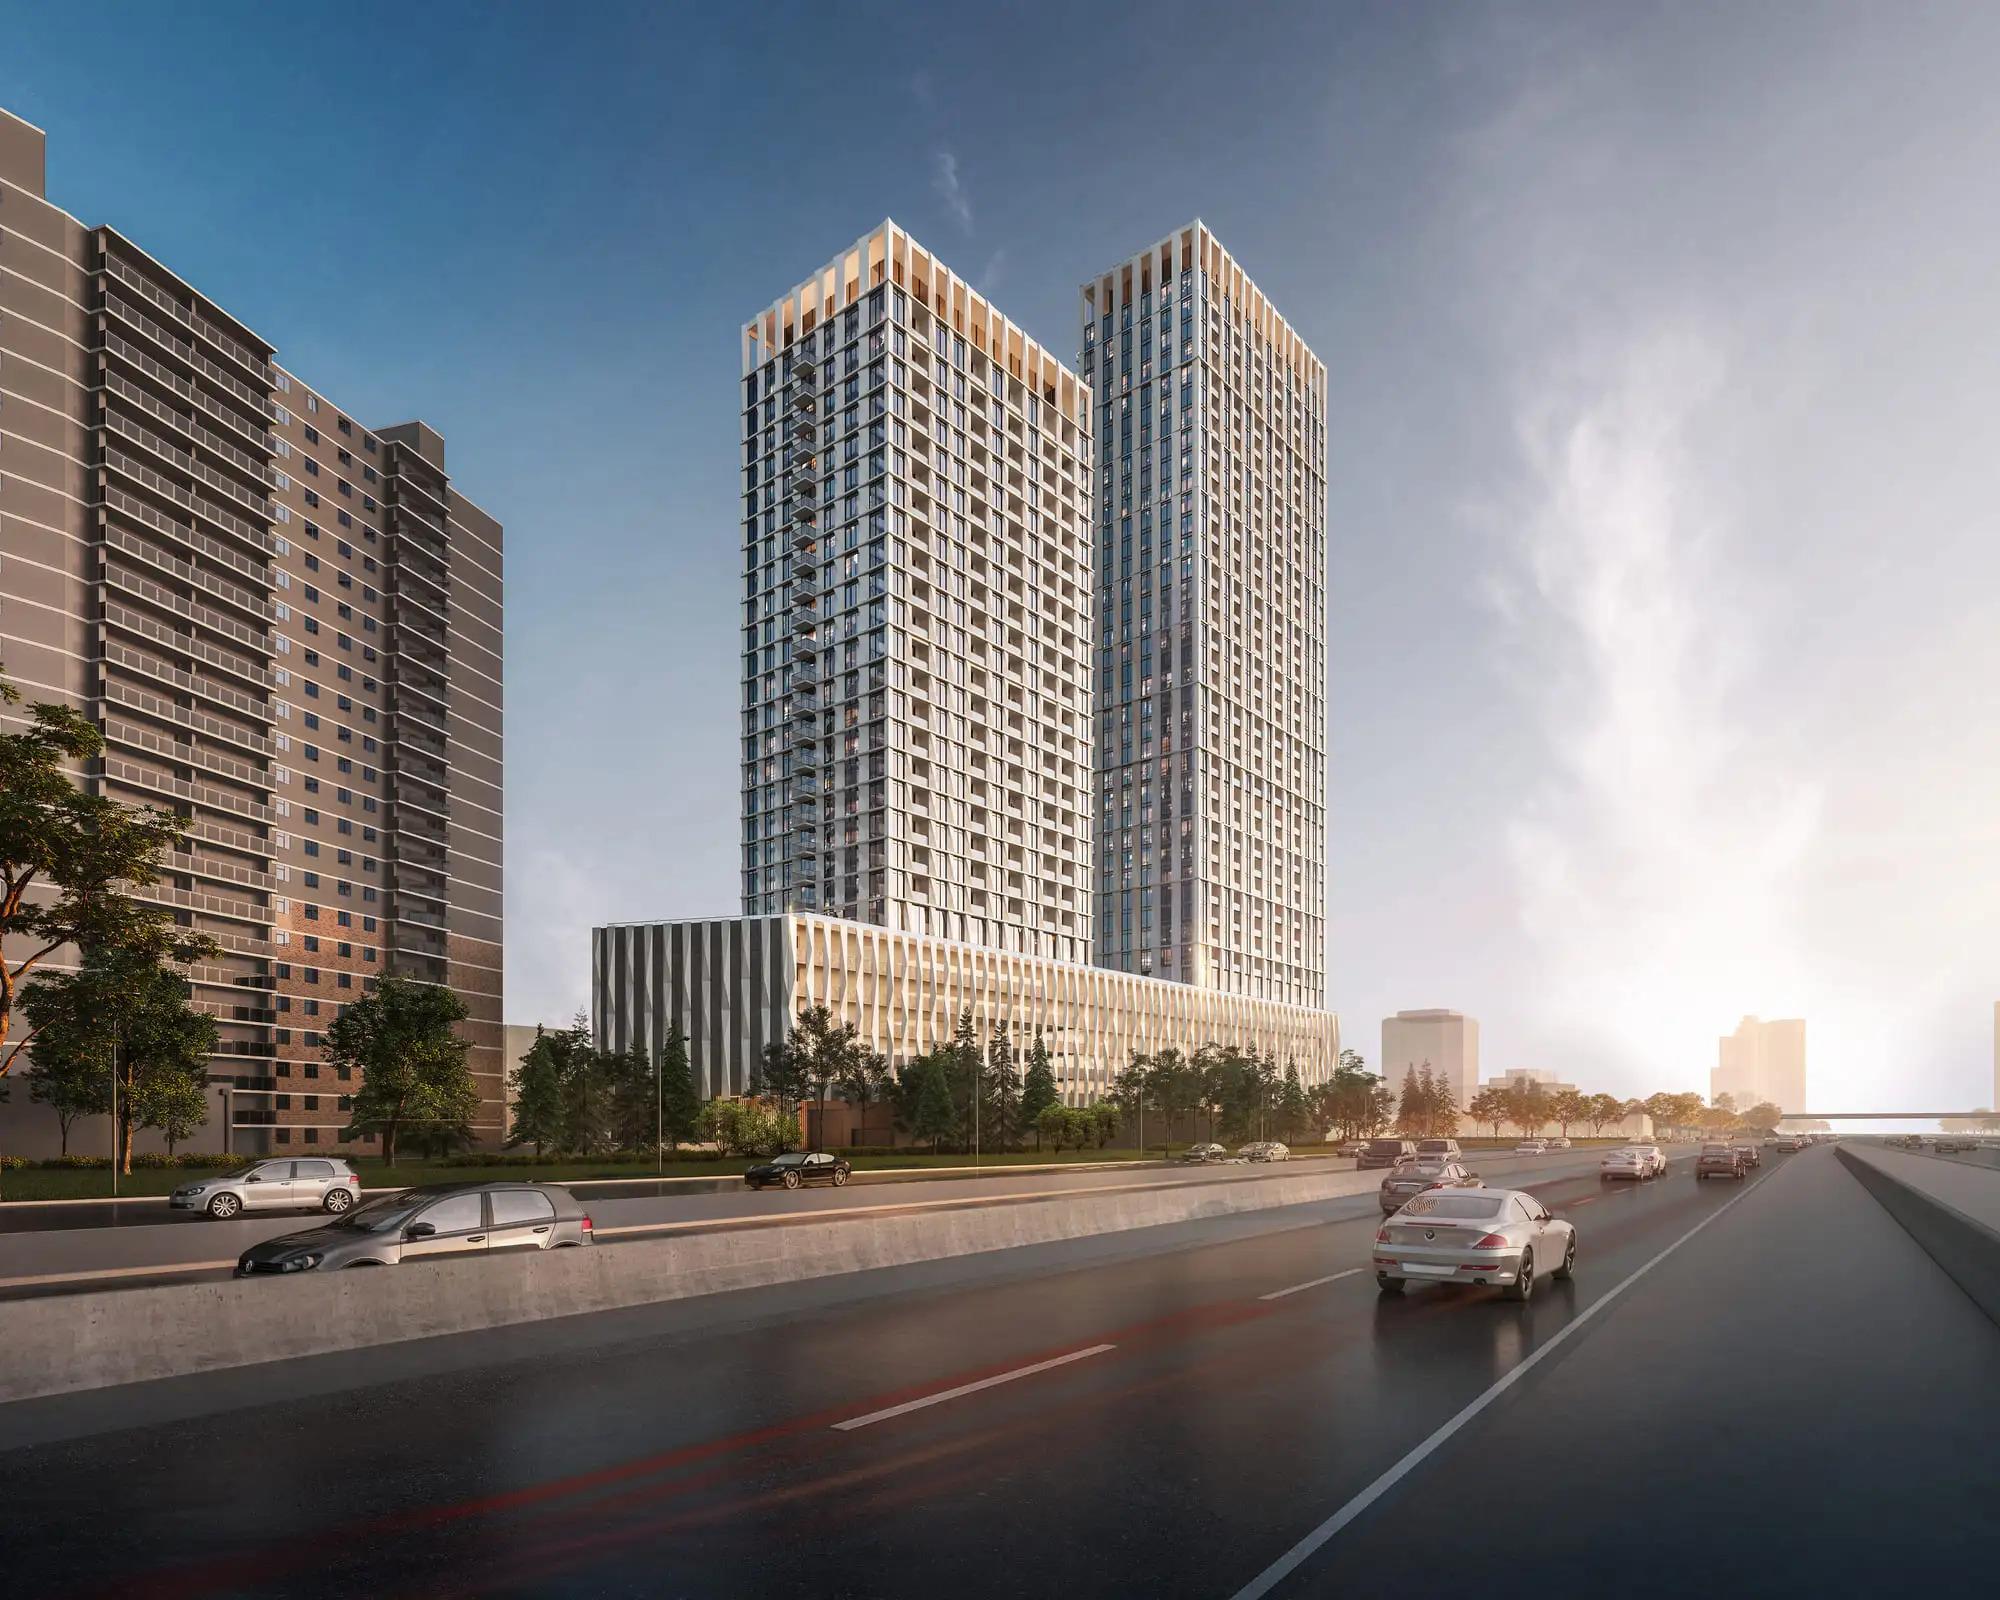 Looking southeast to 5 Capri Road, Etobicoke, Toronto, designed by BDP Quadrangle for Tenblock